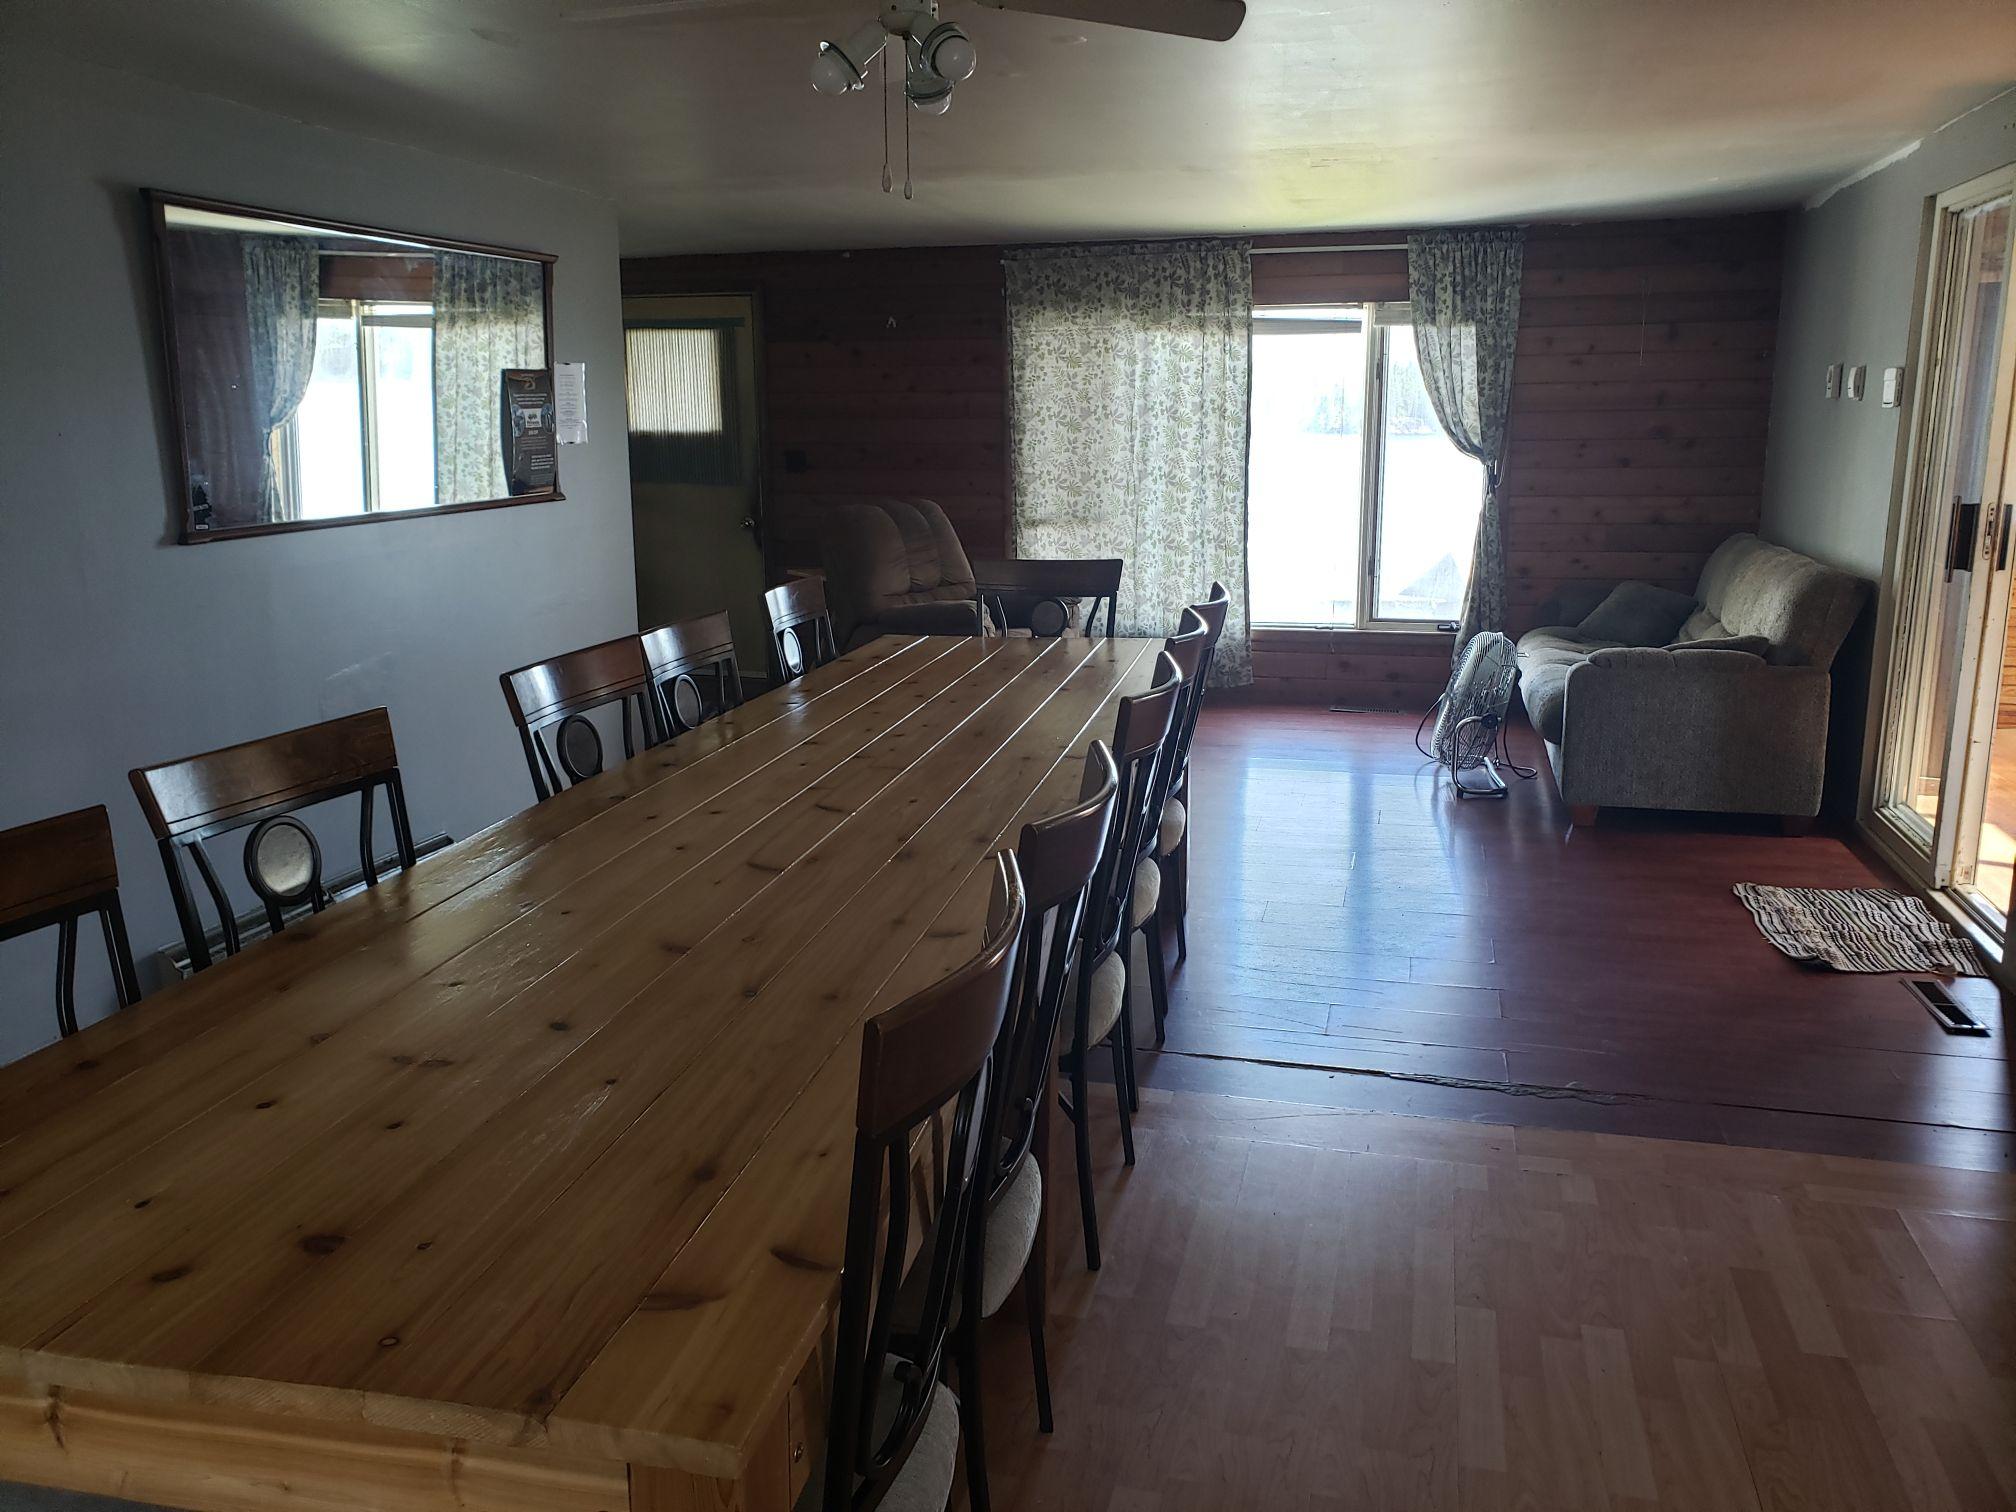 Timberwolf-Dining Room-Trappers Point Camp-Sturgeon Lake-Savant Lake-Ontario